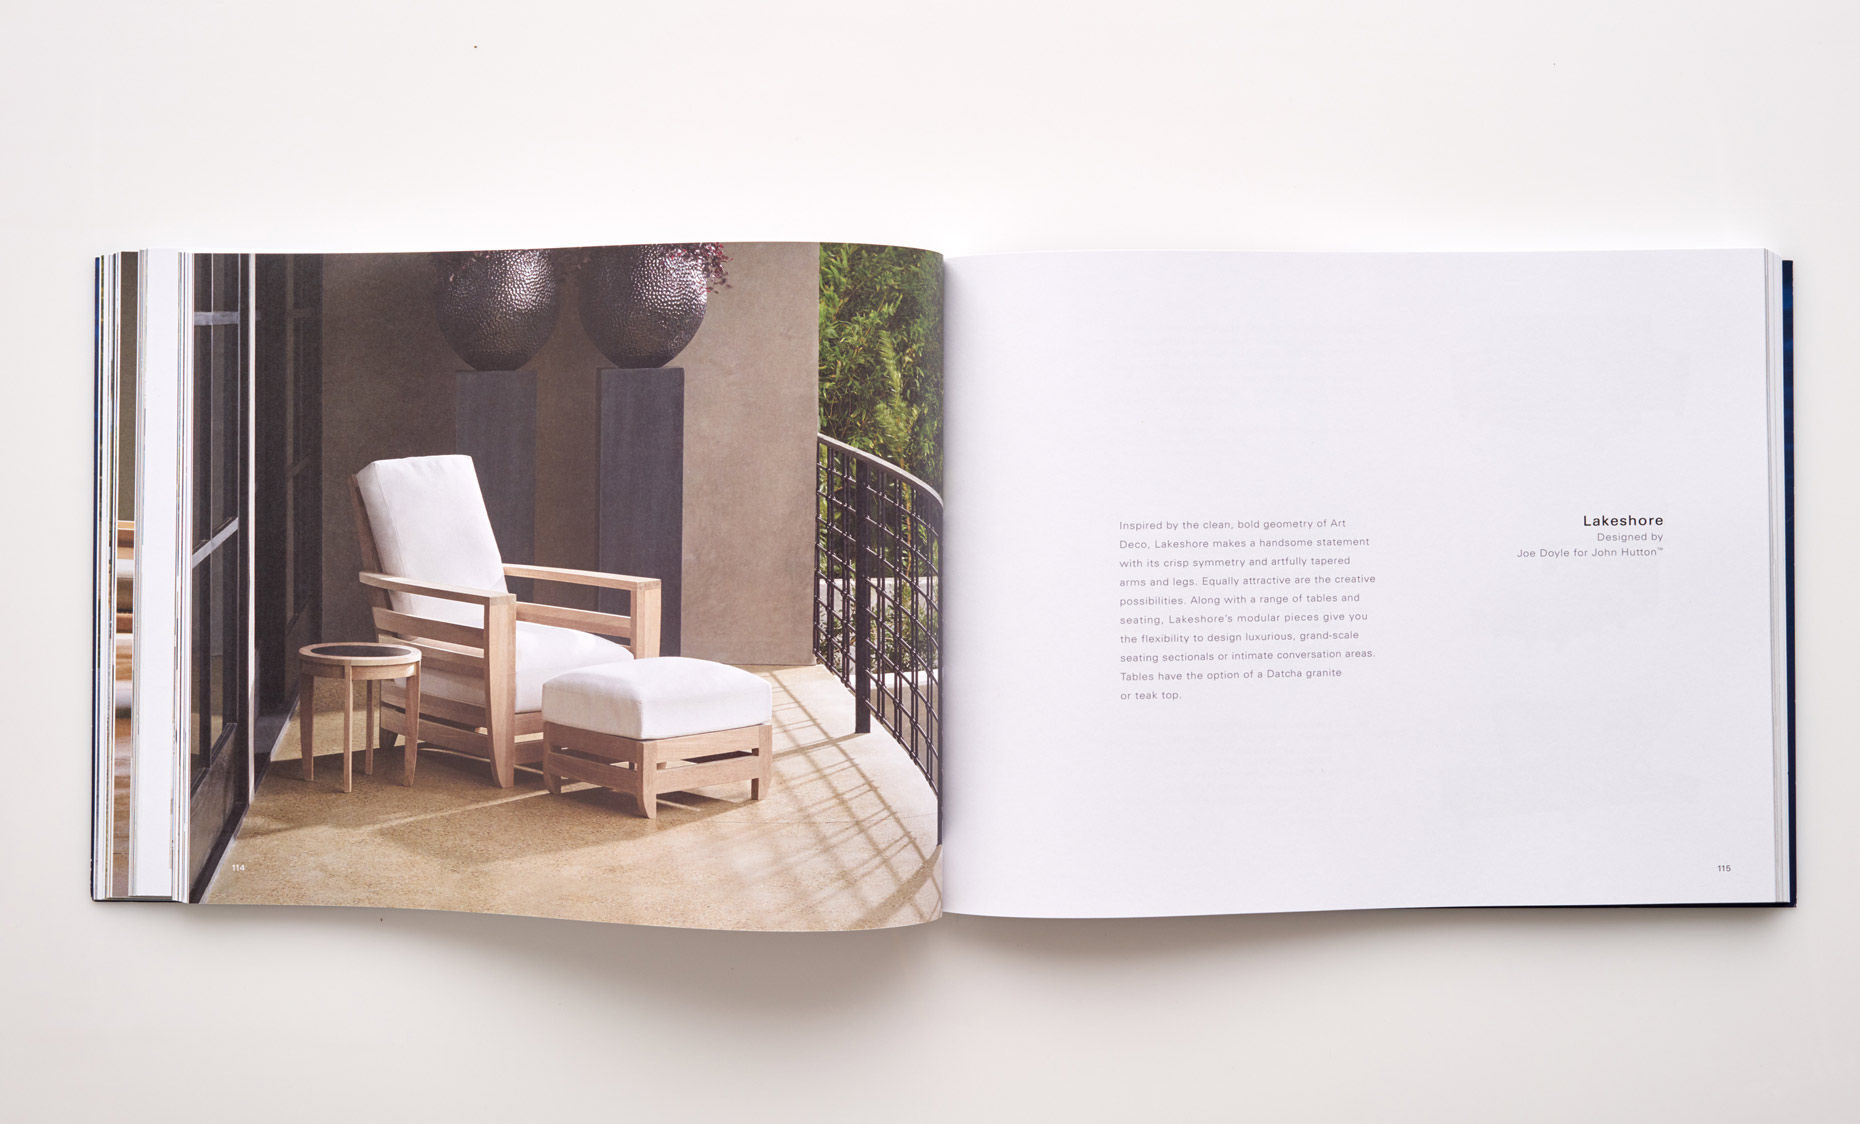 Stephen Karlisch Sutherland Furniture Lakeshore Lounge